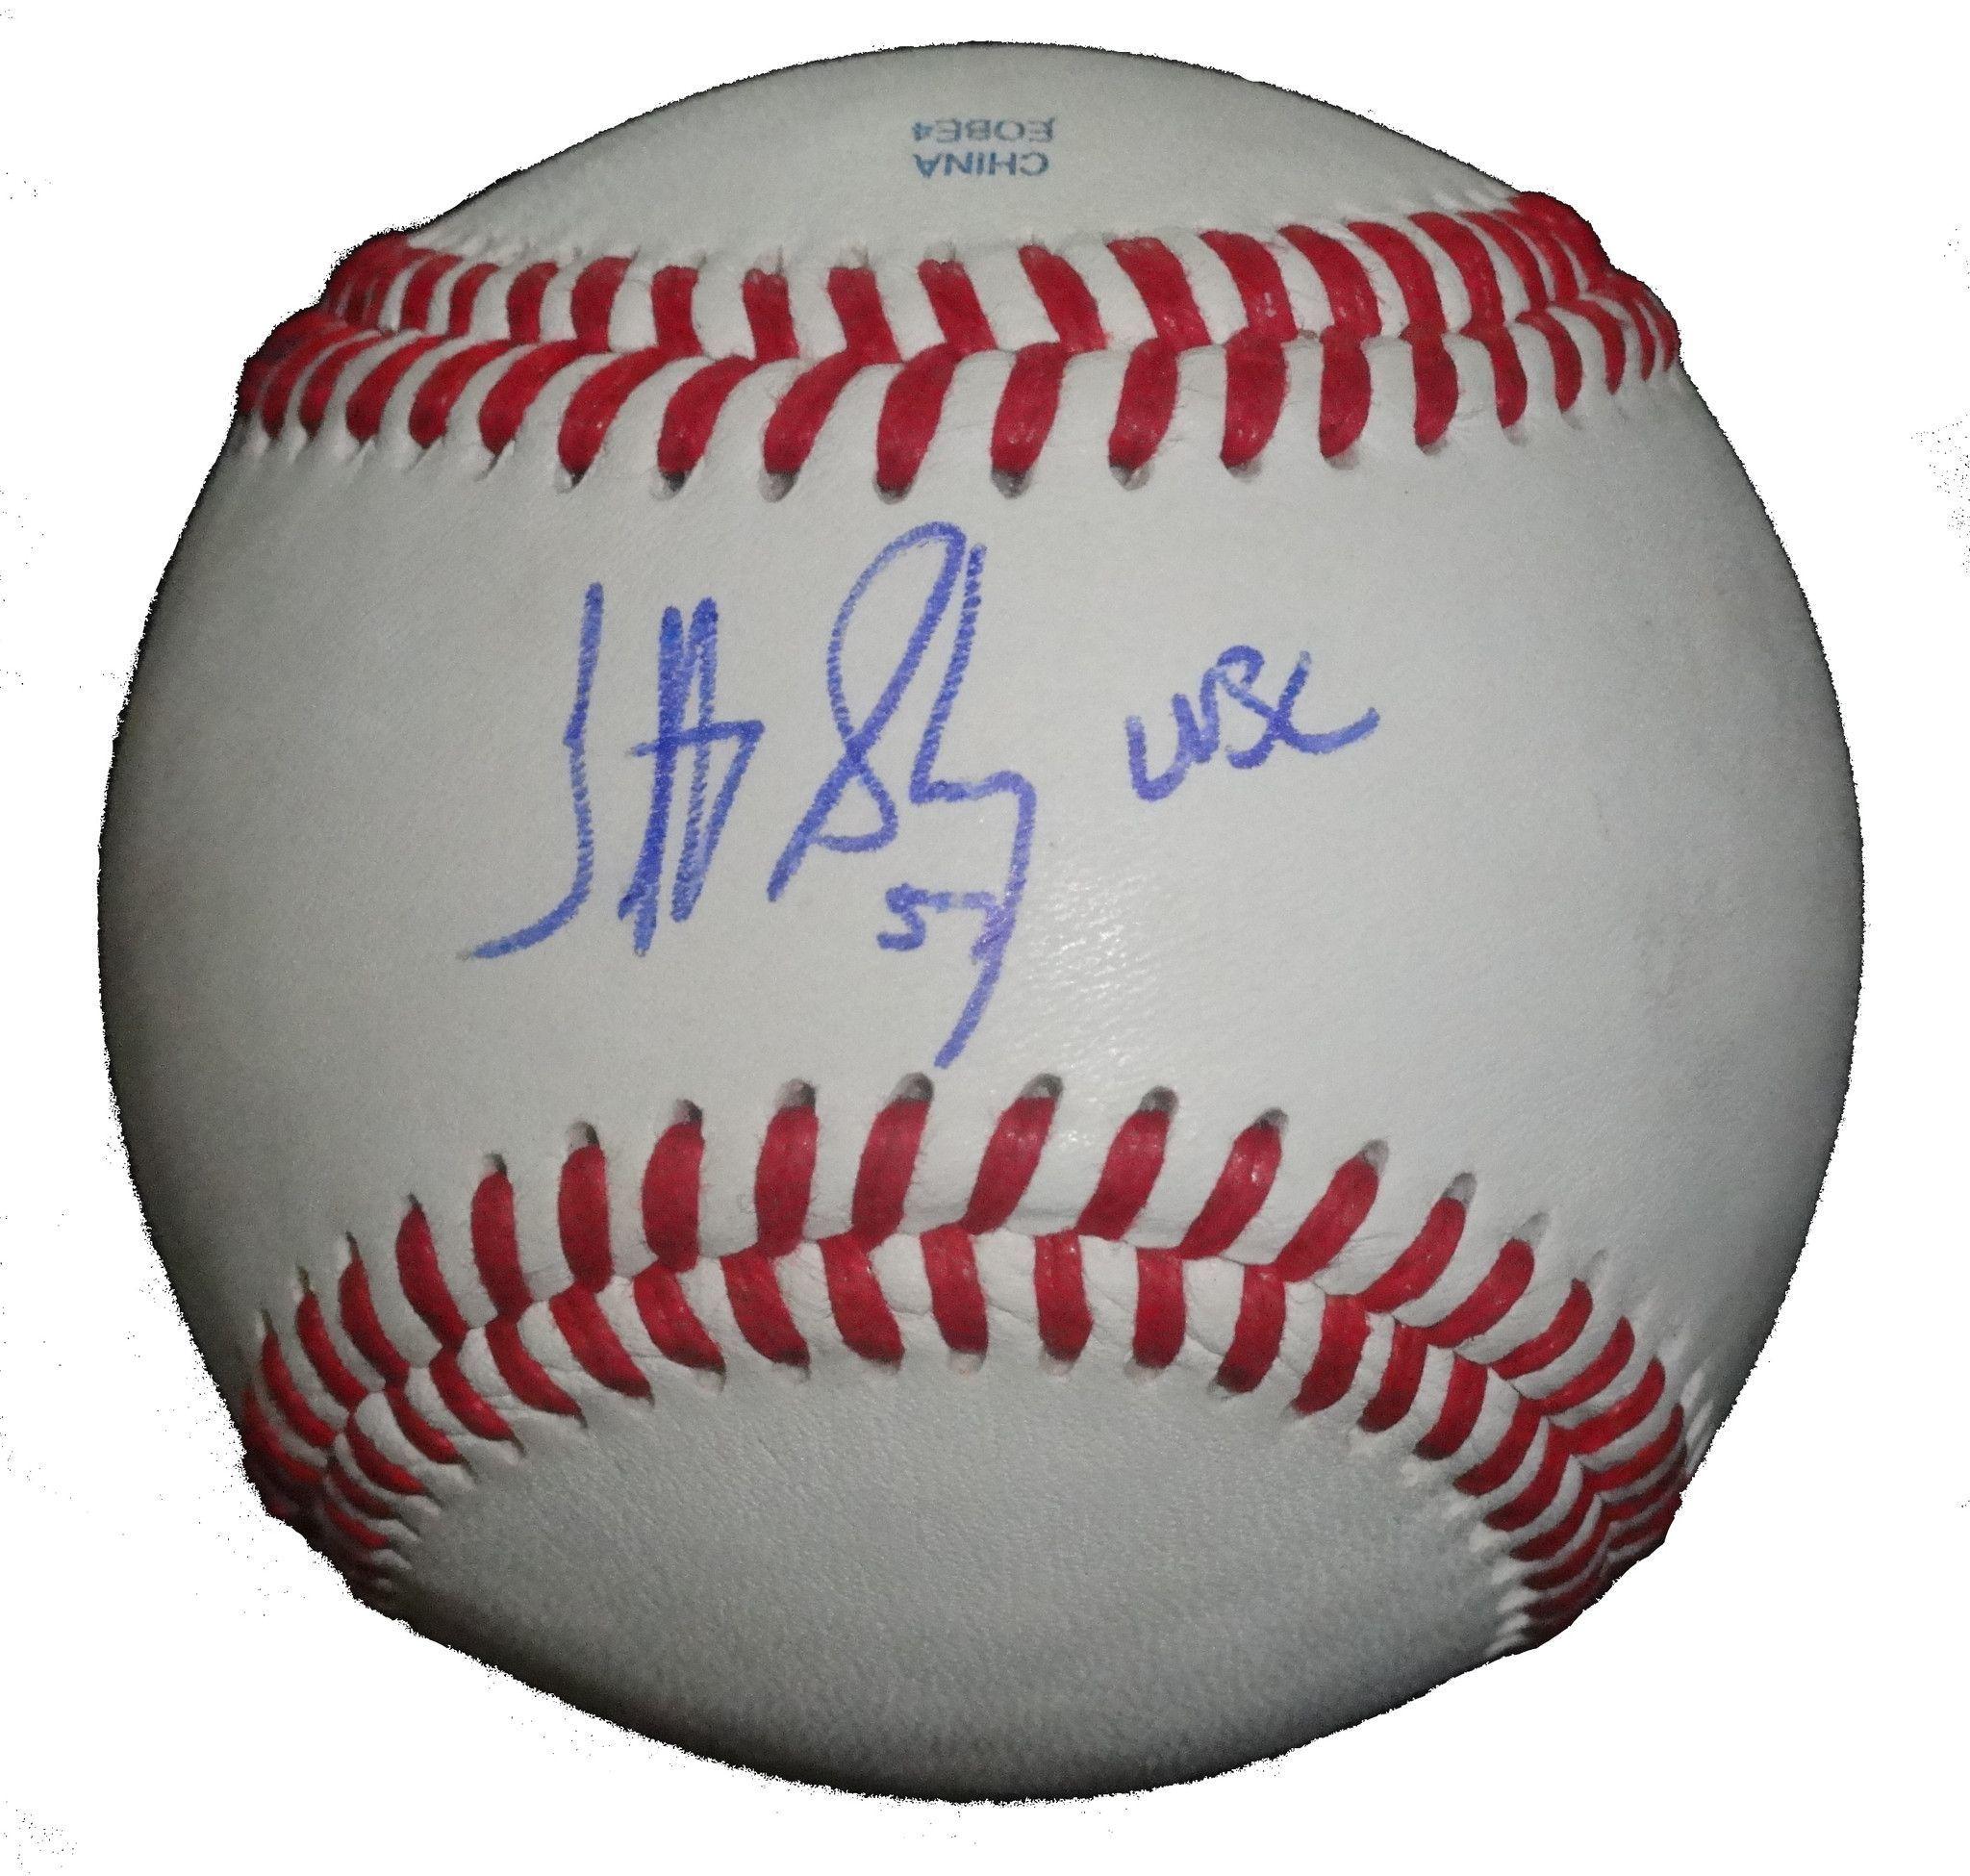 Sports Mem, Cards & Fan Shop Jonathan Johnson Autographed Official Rawlings Baseball Autographs-original